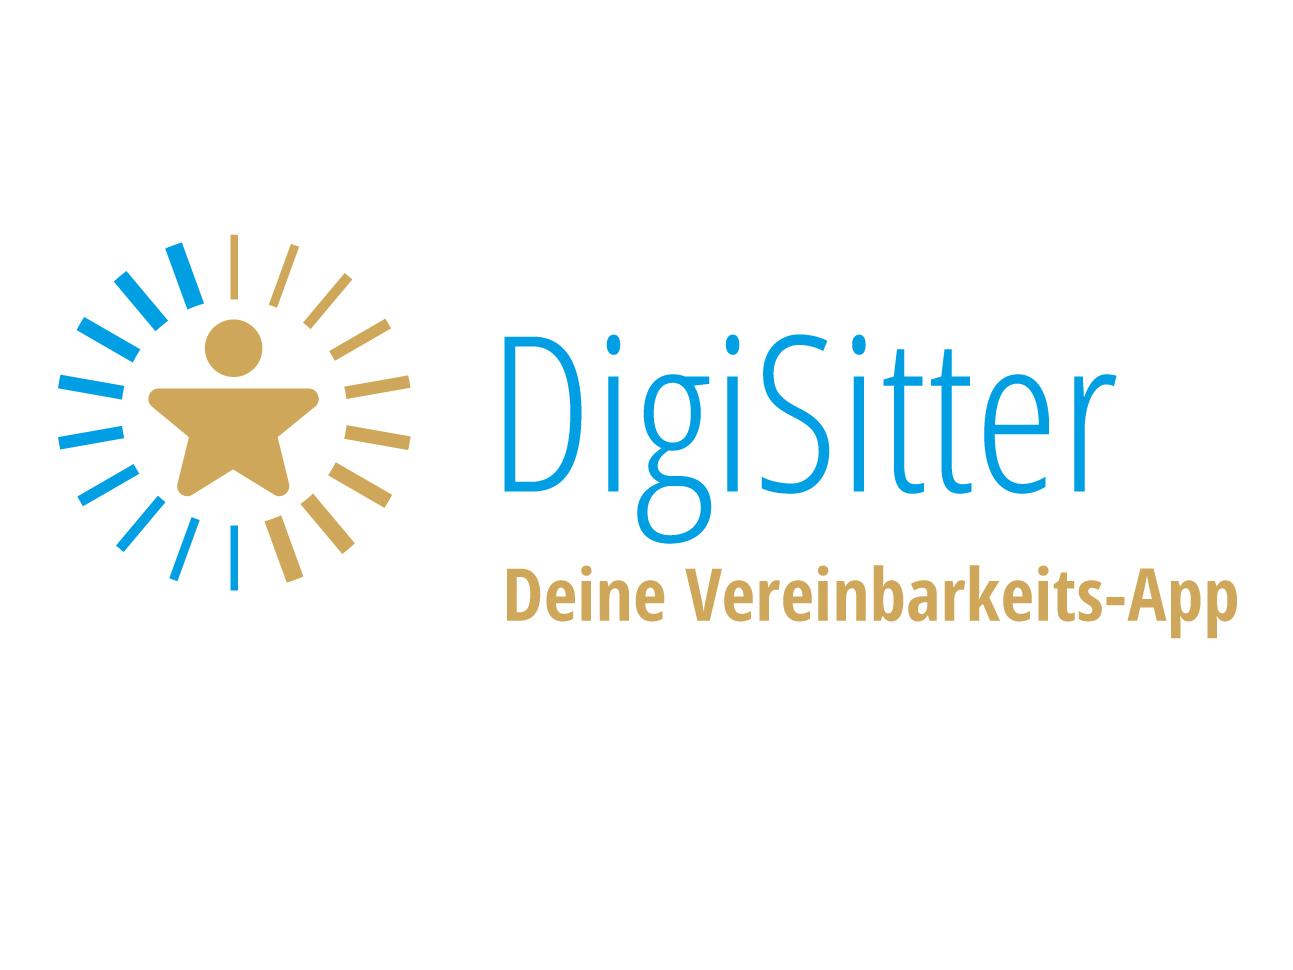 martin_zech_design_projekt_design_digisitter_logo